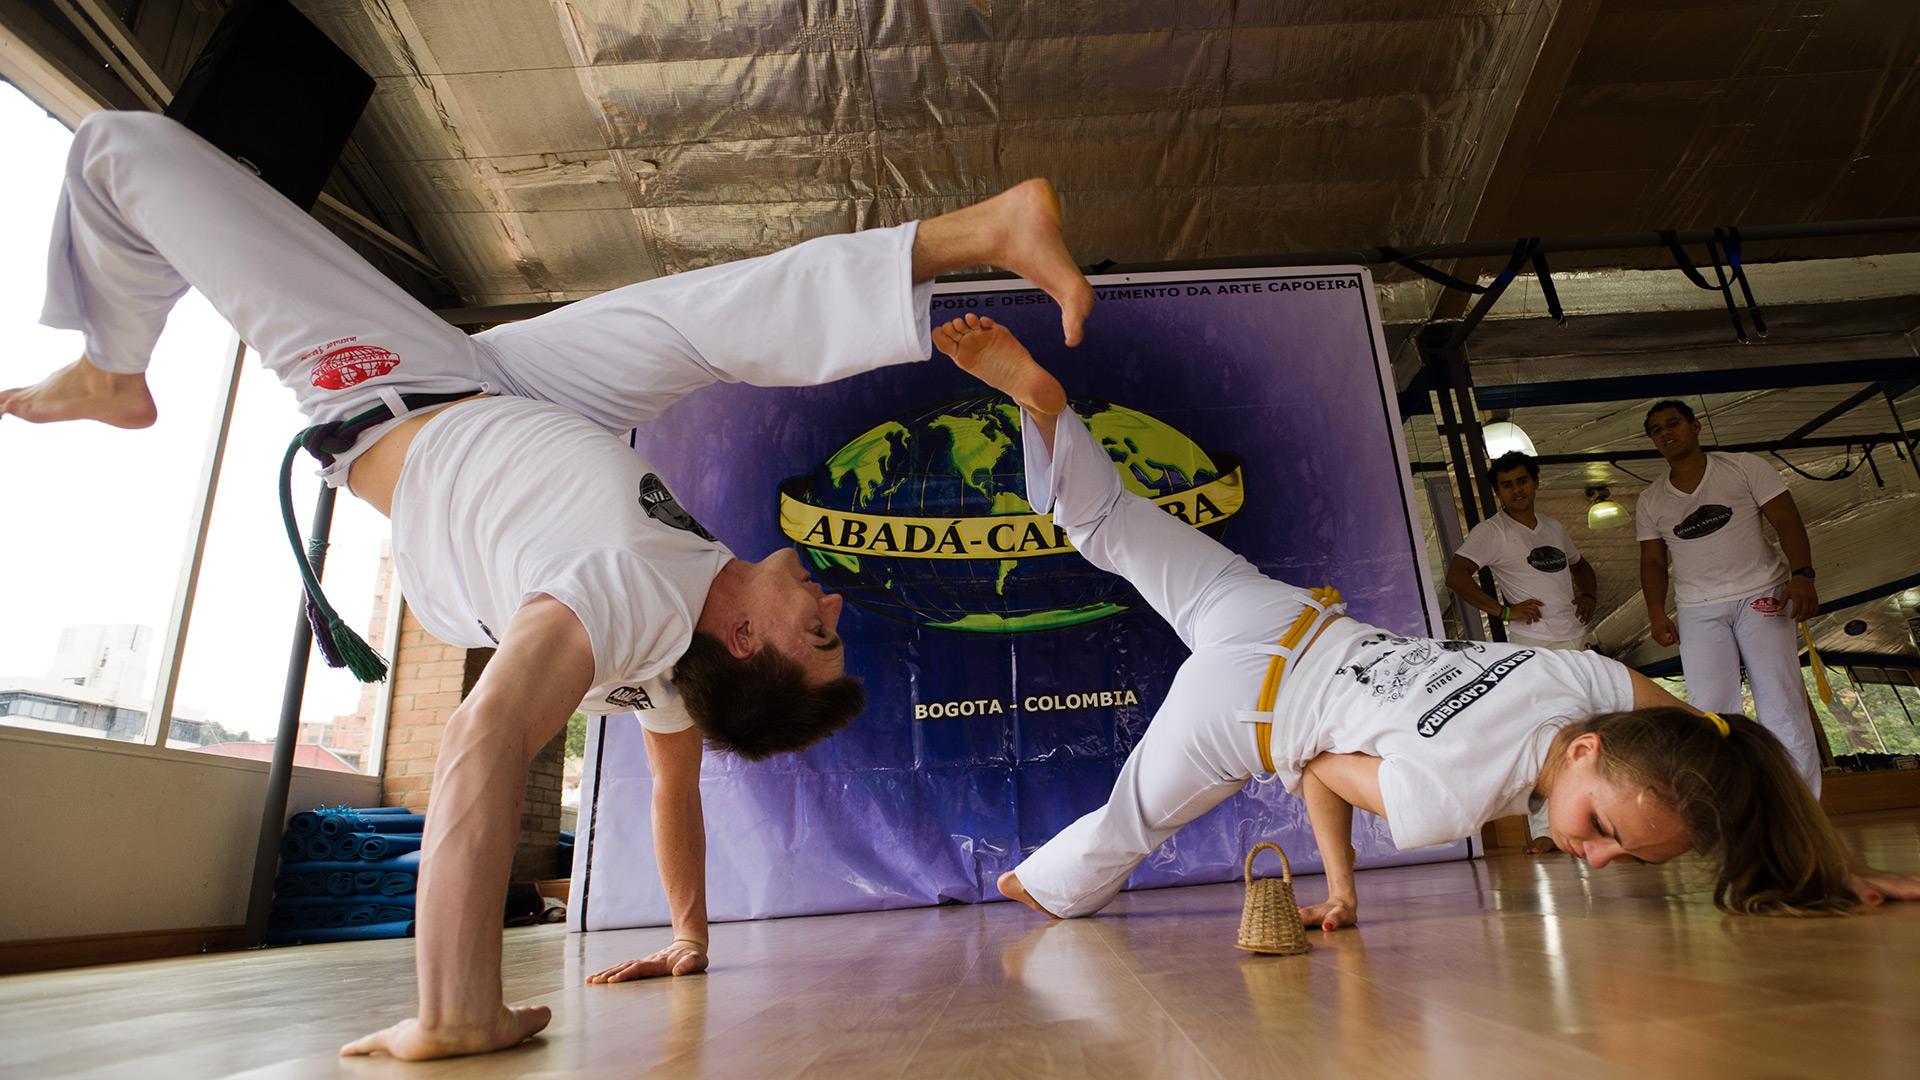 39Colombia_100Bogota_950Capoeira_100ABADA-Capoeira_112ABADA_HB147_200812_7^1920x